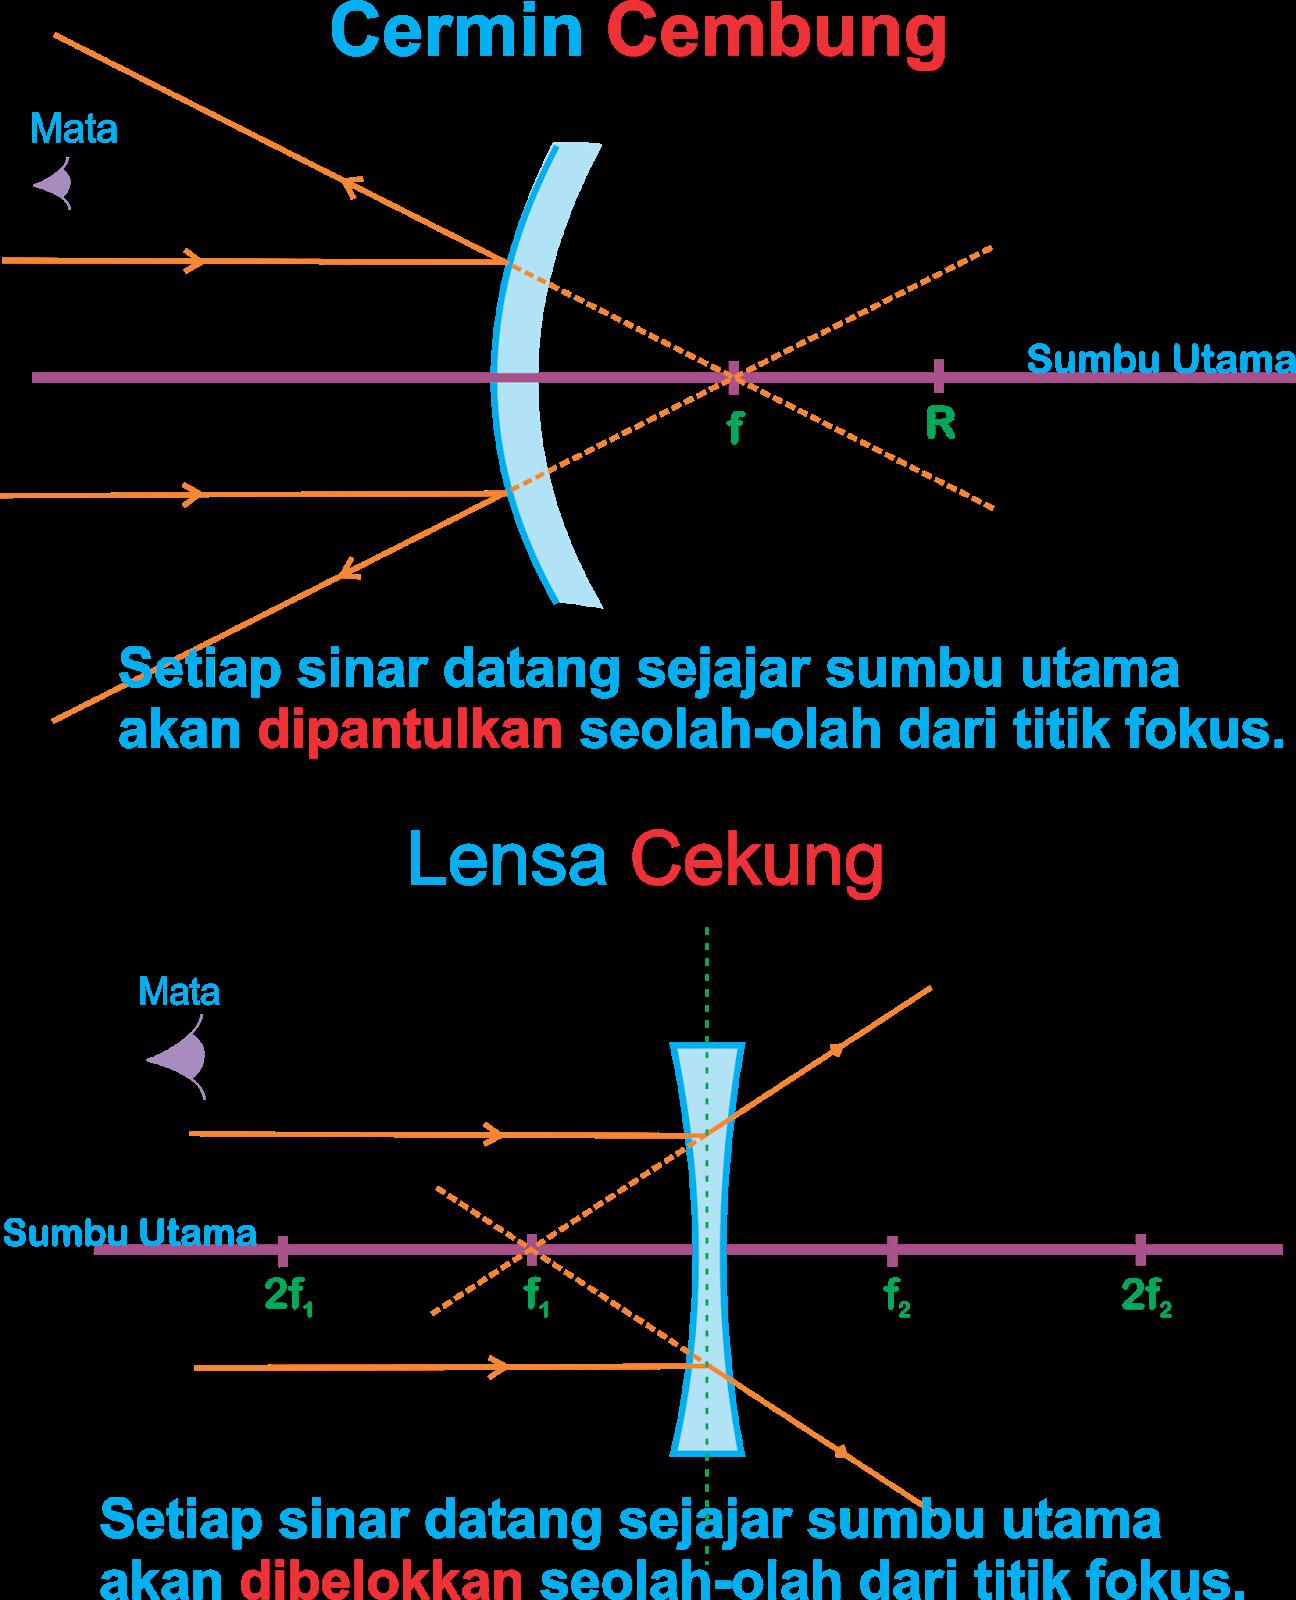 Contoh Lensa Cekung : contoh, lensa, cekung, Perbedaan, Rumus, Cermin, Cekung, Cembung, CERMITOK